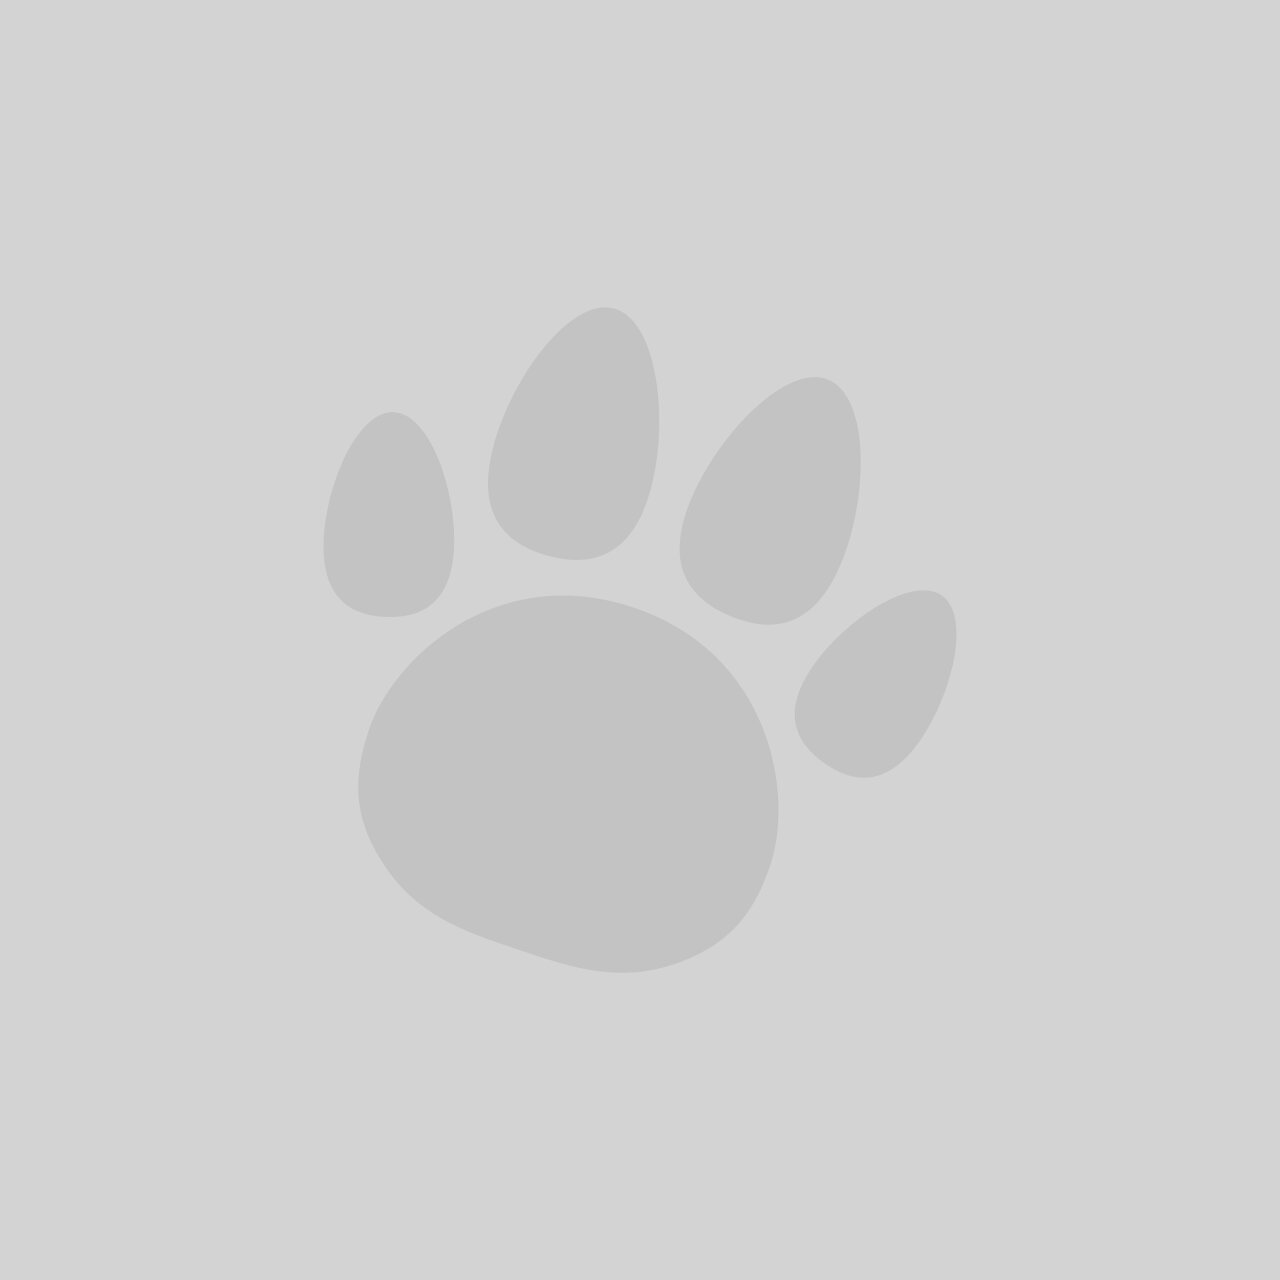 Iams Minis Dog Treats Lamb & Cranberry 100g